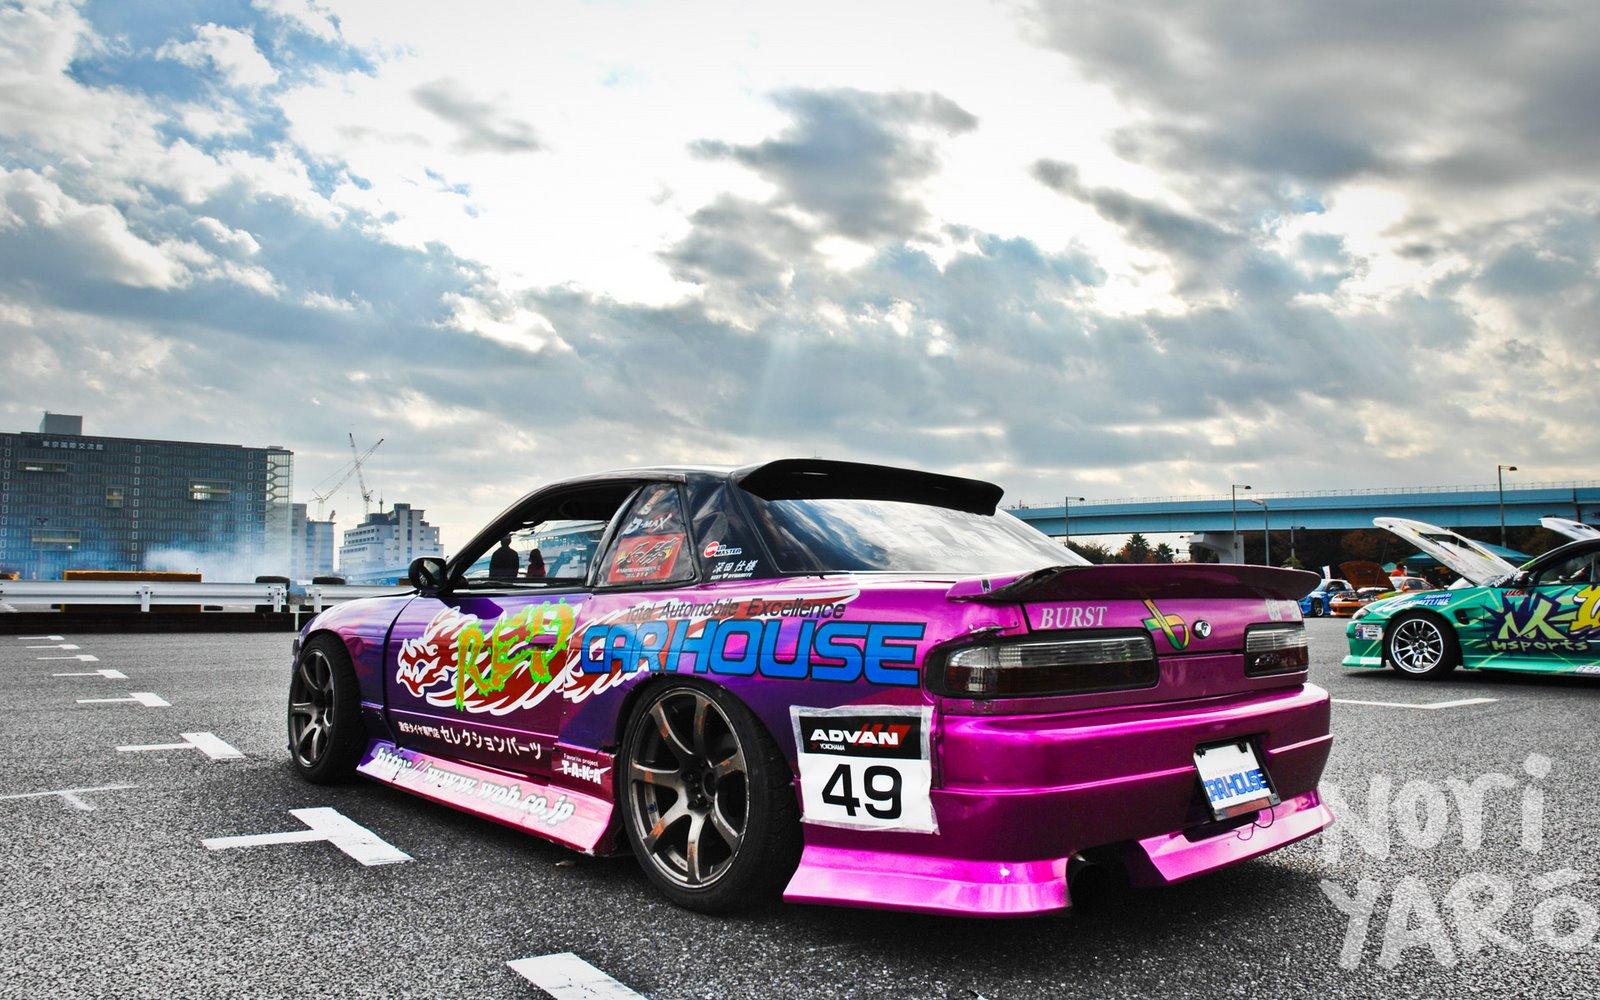 http://1.bp.blogspot.com/-XdGWE7SLRVo/TVj7GDqBq0I/AAAAAAAAASk/Yvc9FsuQ3uA/s1600/S13fujio+akihito.jpg